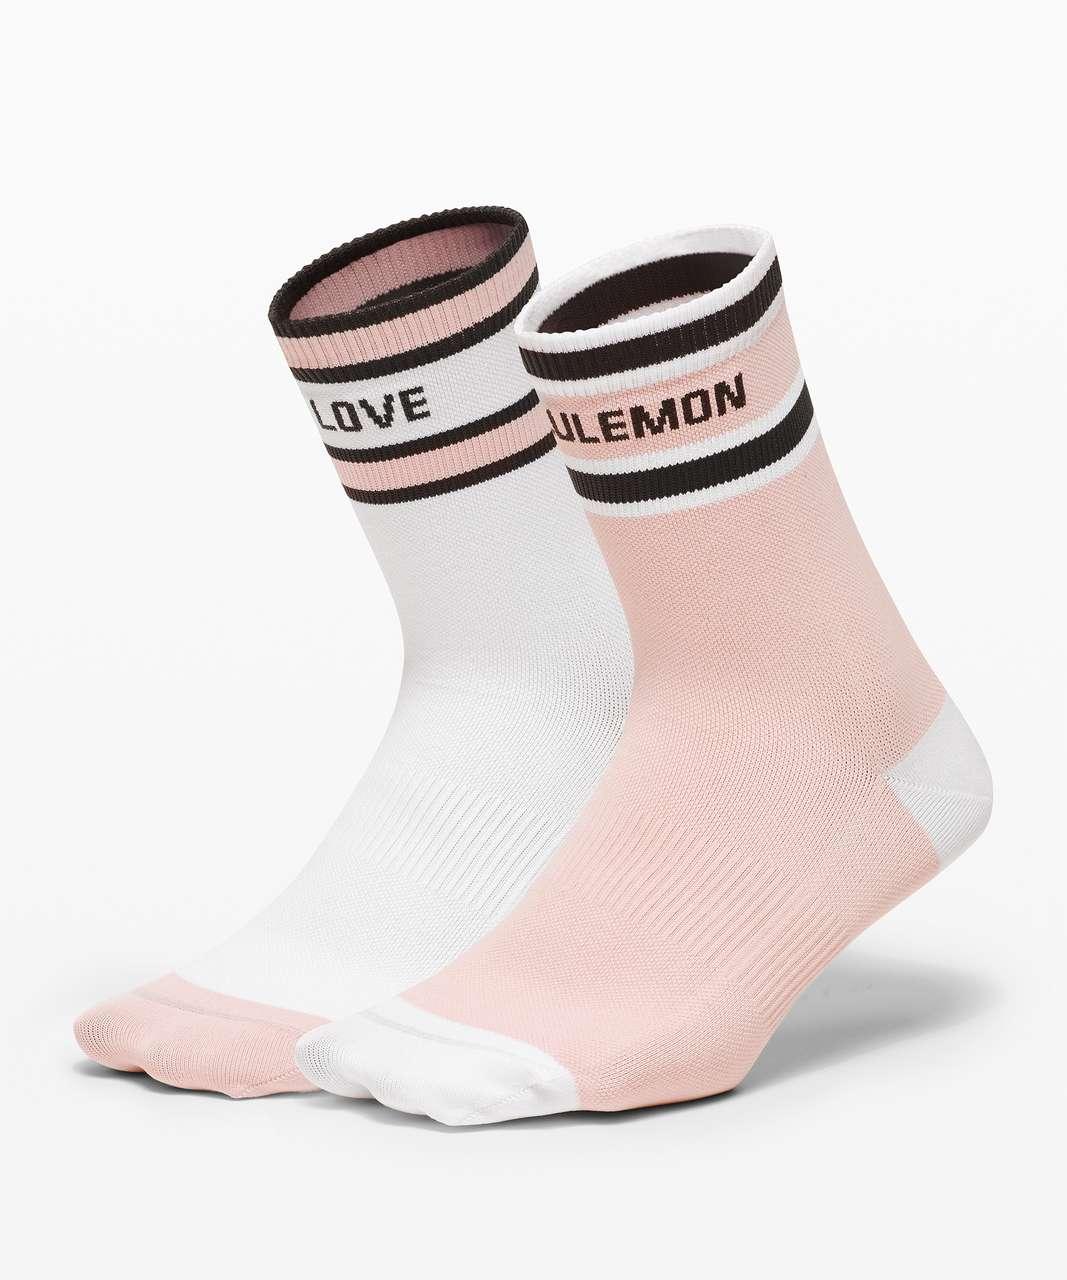 Lululemon Tale To Tell Quarter Sock*2 Pack - White / Misty Pink / Graphite Grey